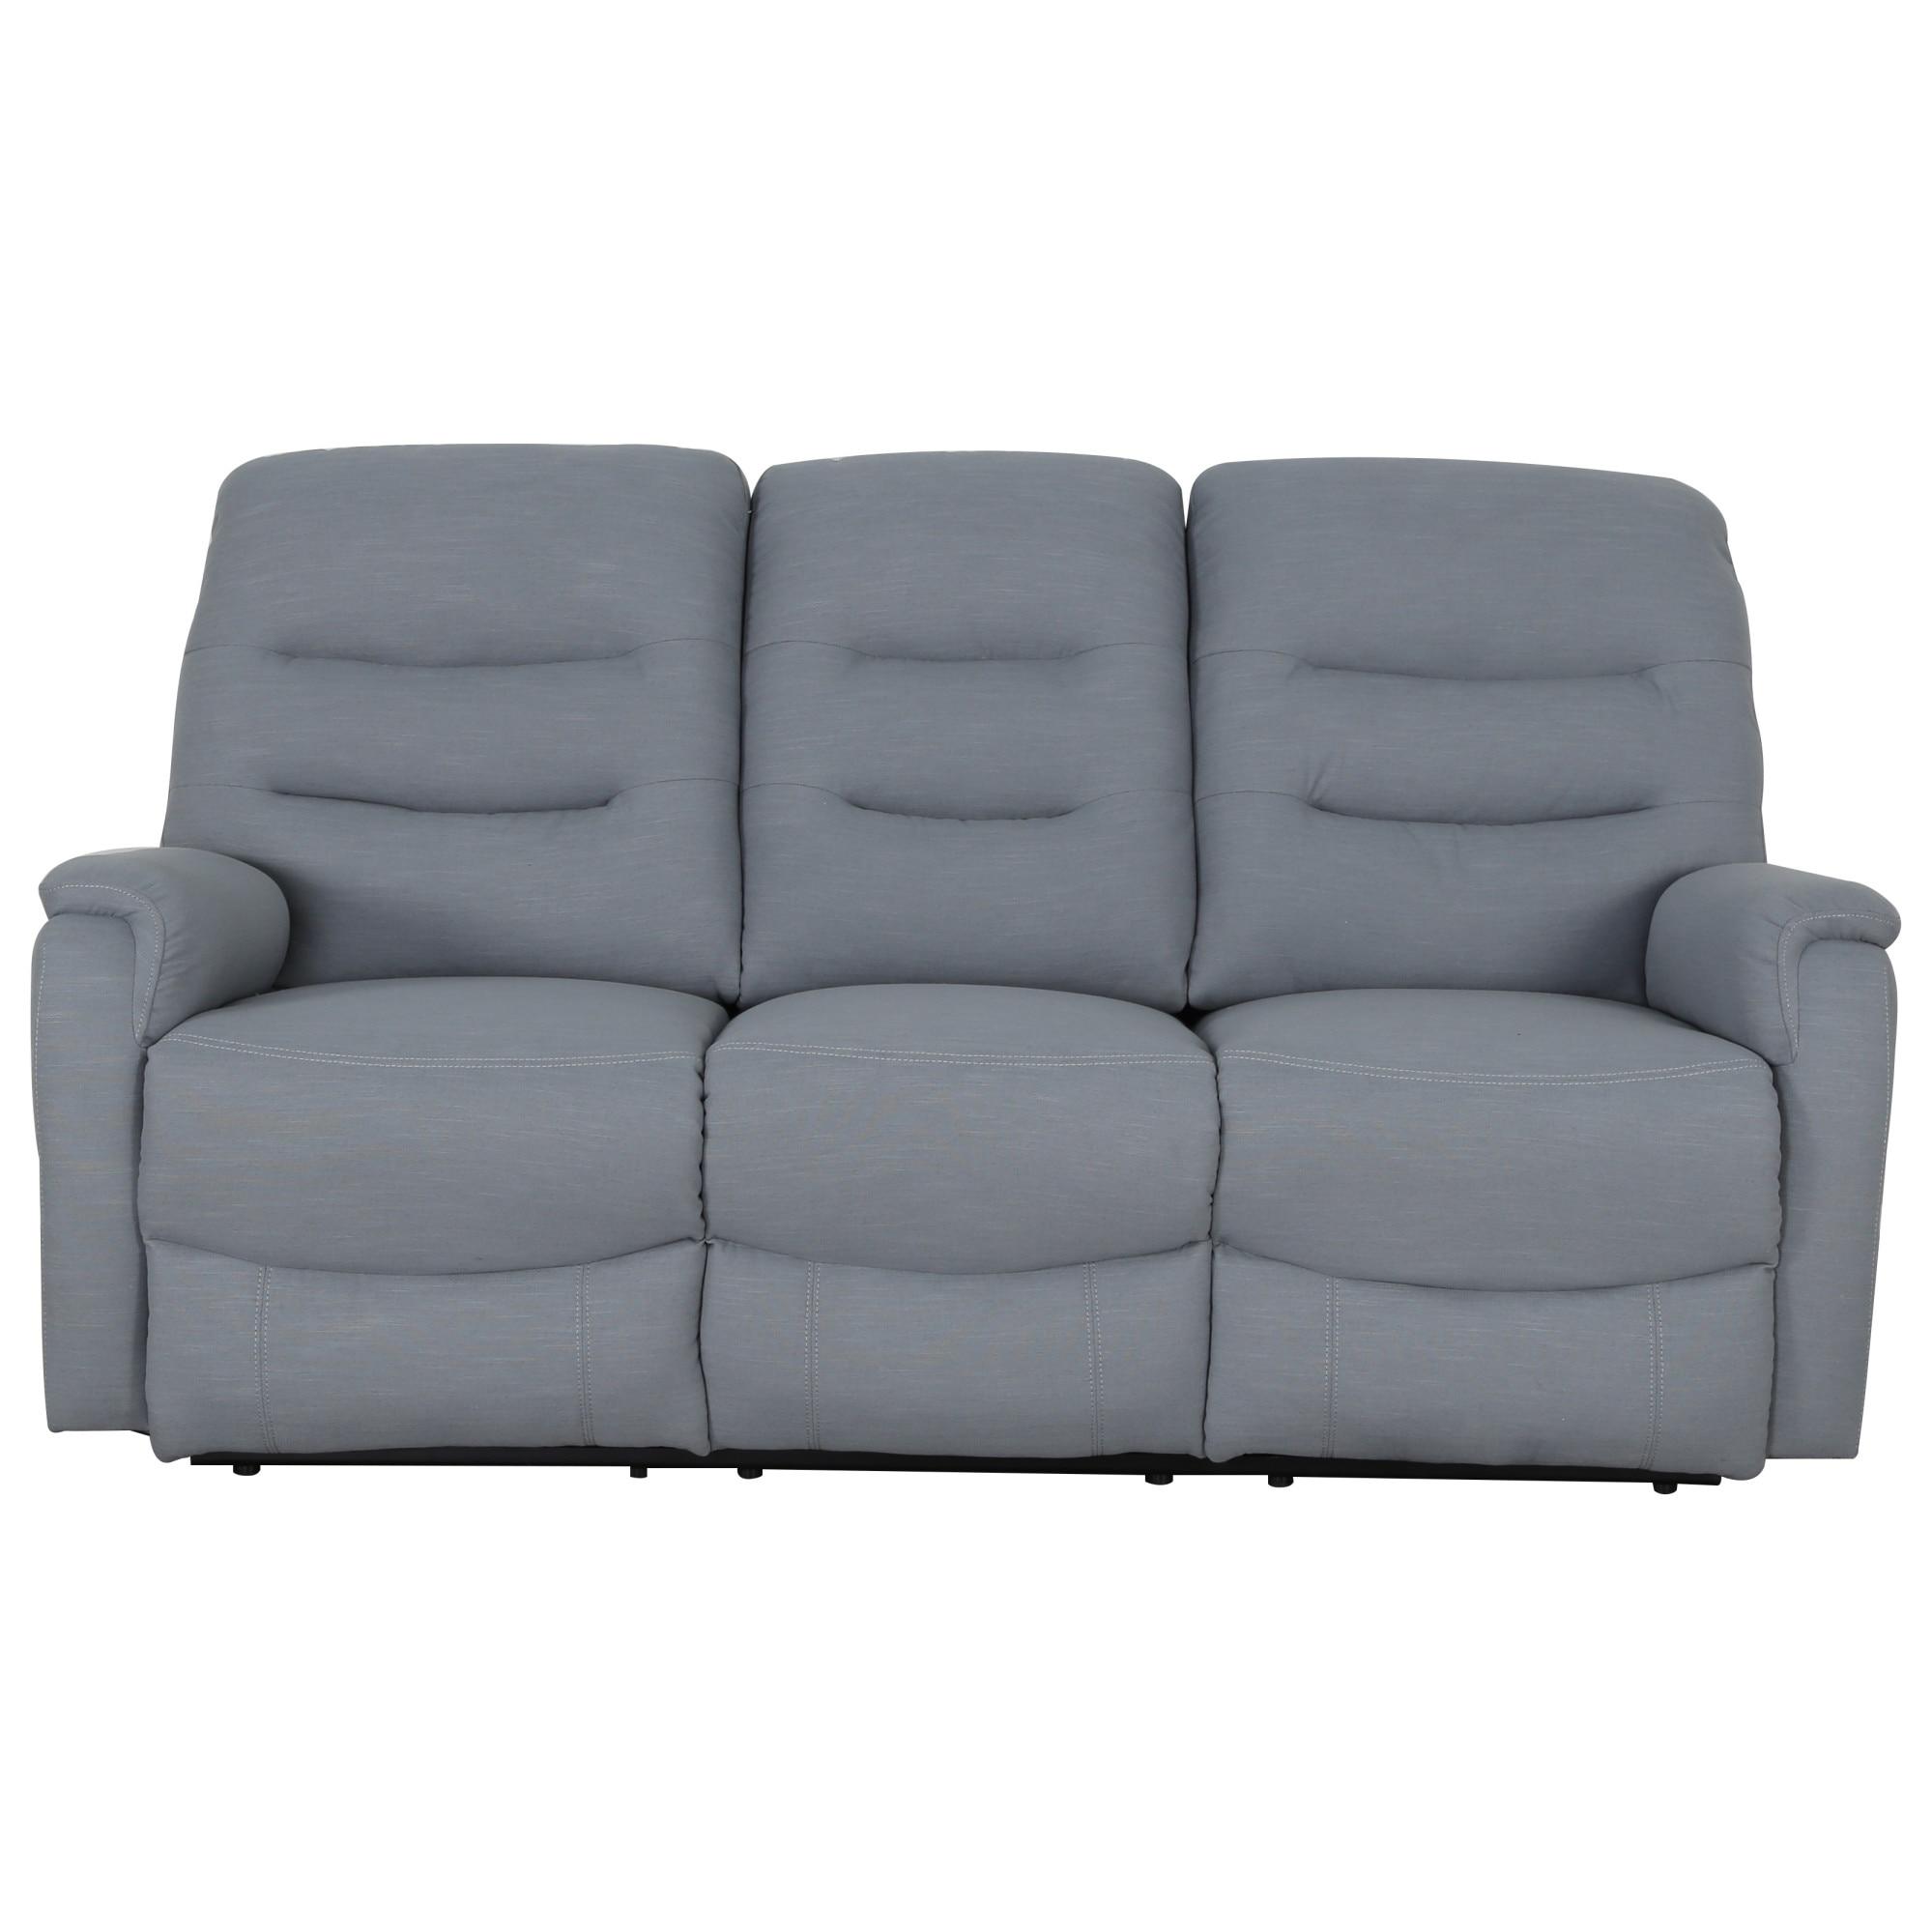 Fotografie Canapea Kring Sylvie Vive cu 3 locuri, 2 reclinere si 3 trepte de confort, turcoaz, 193 x 100 x 101 cm